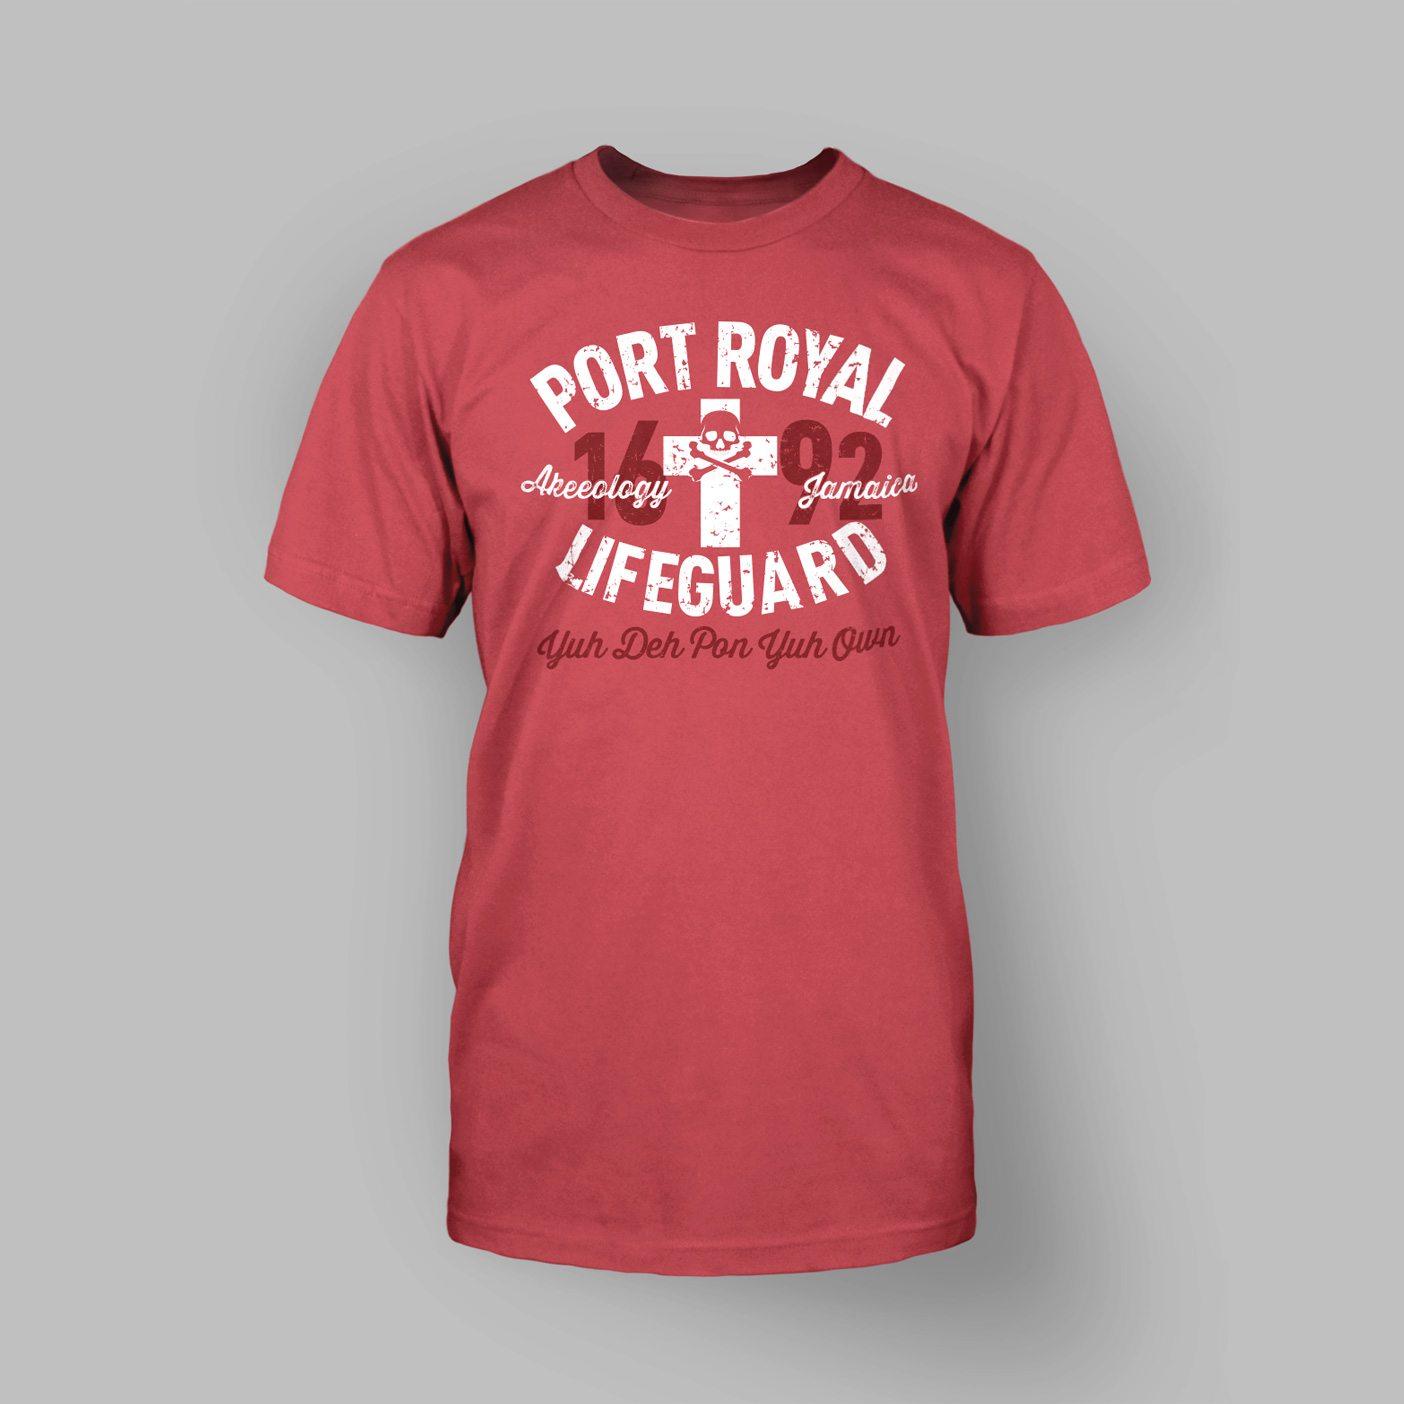 Port Royal Lifeguard: Ackeeology